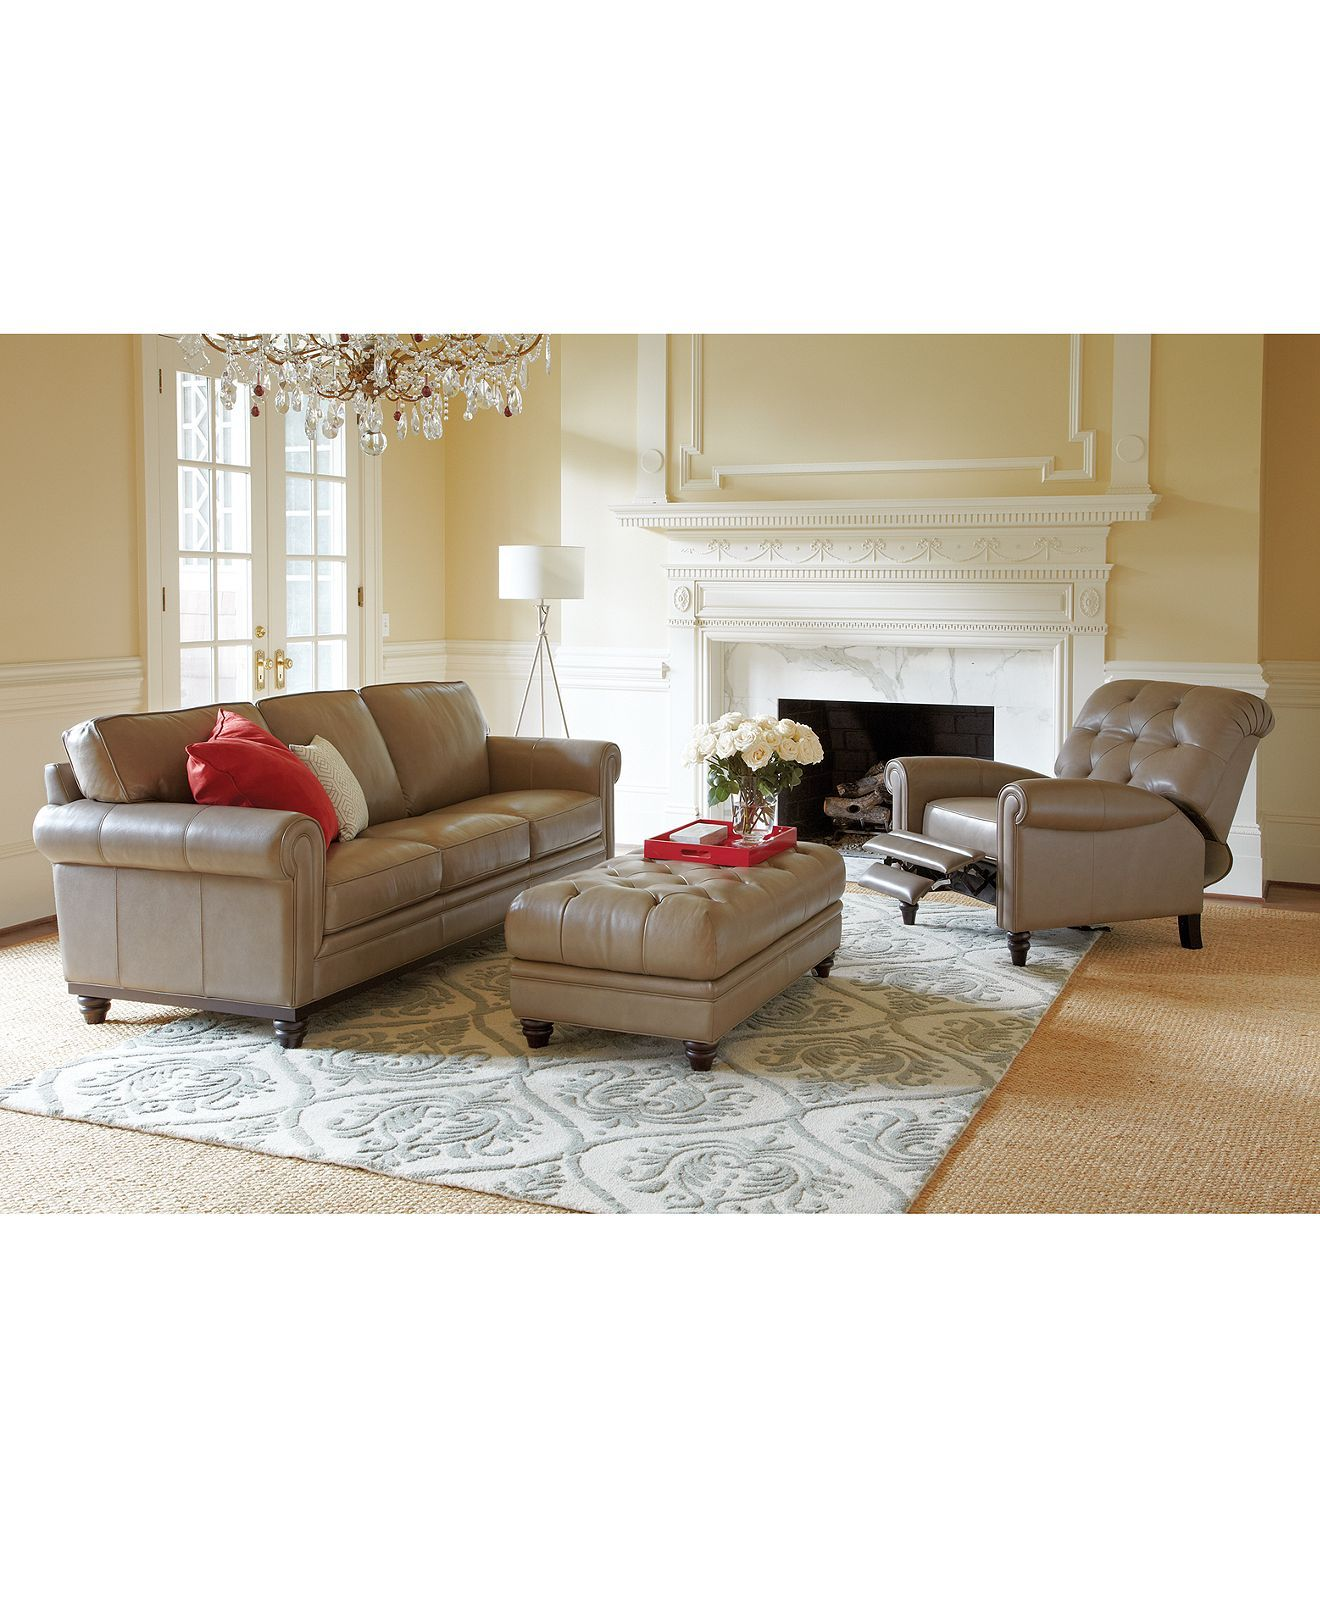 Martha Stewart Collection Bradyn Leather Sofa Collection, Created For Macyu0027s